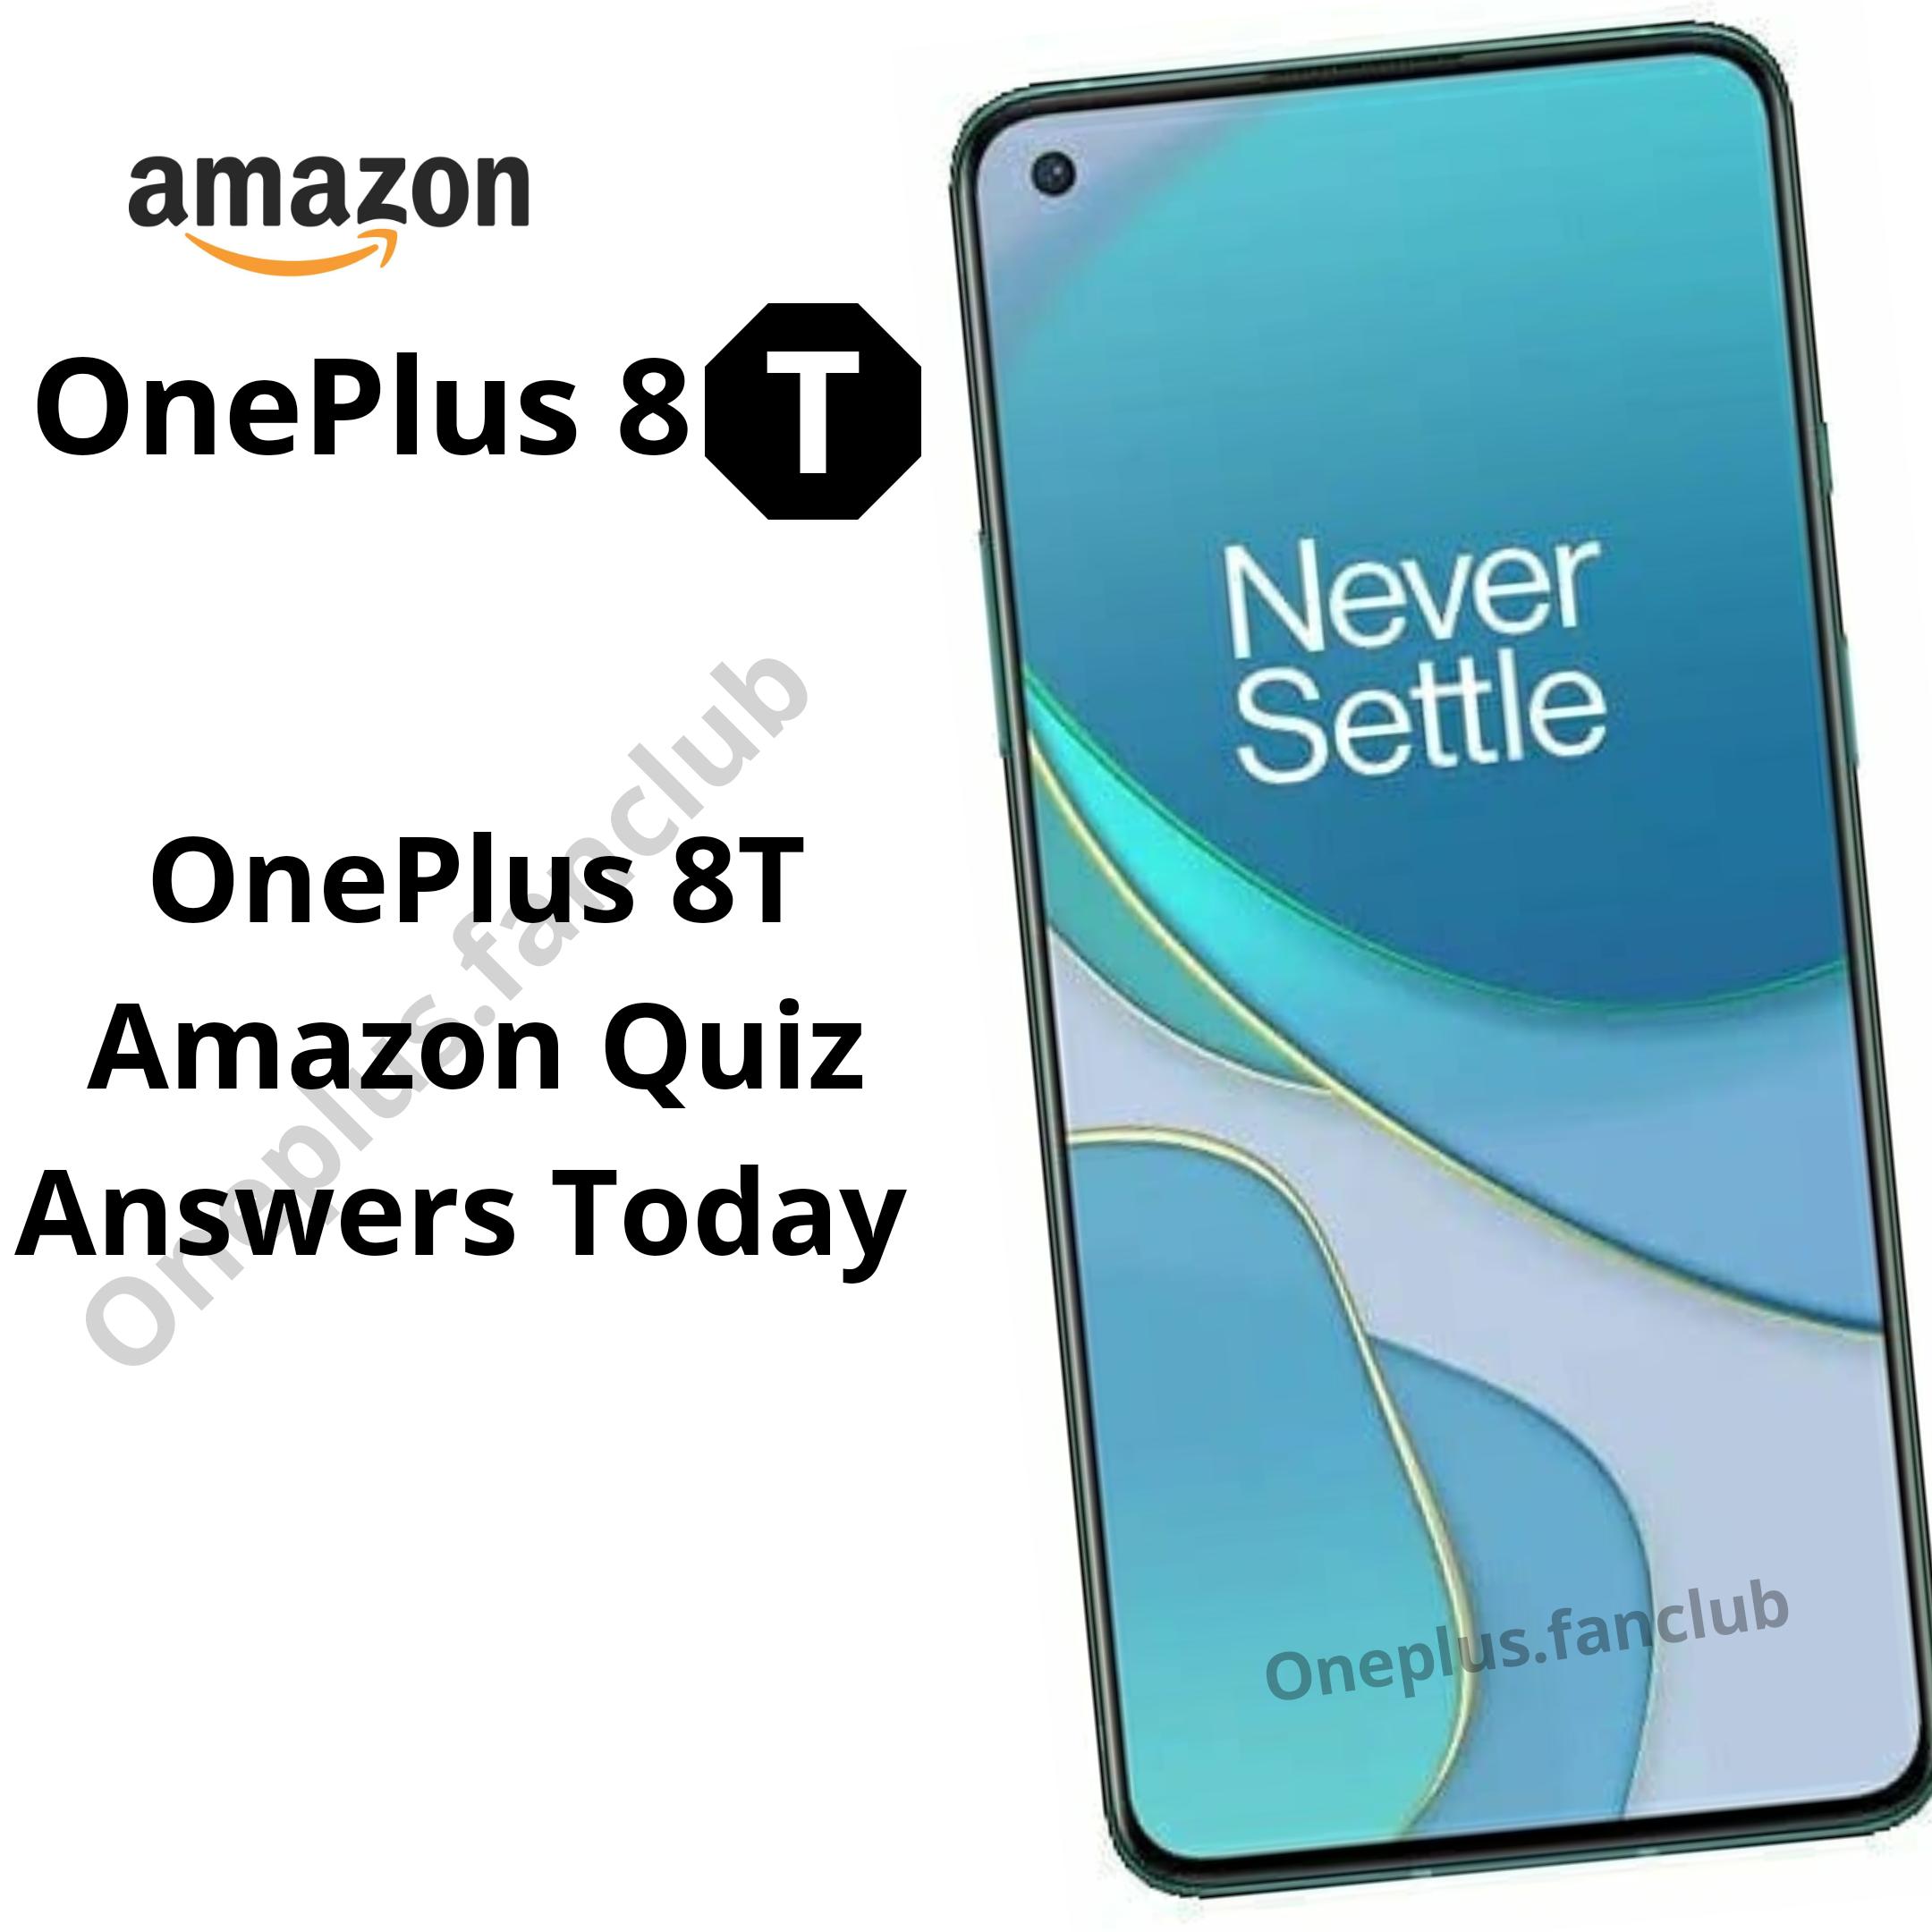 OnePlus 8T Amazon Quiz Answers Today